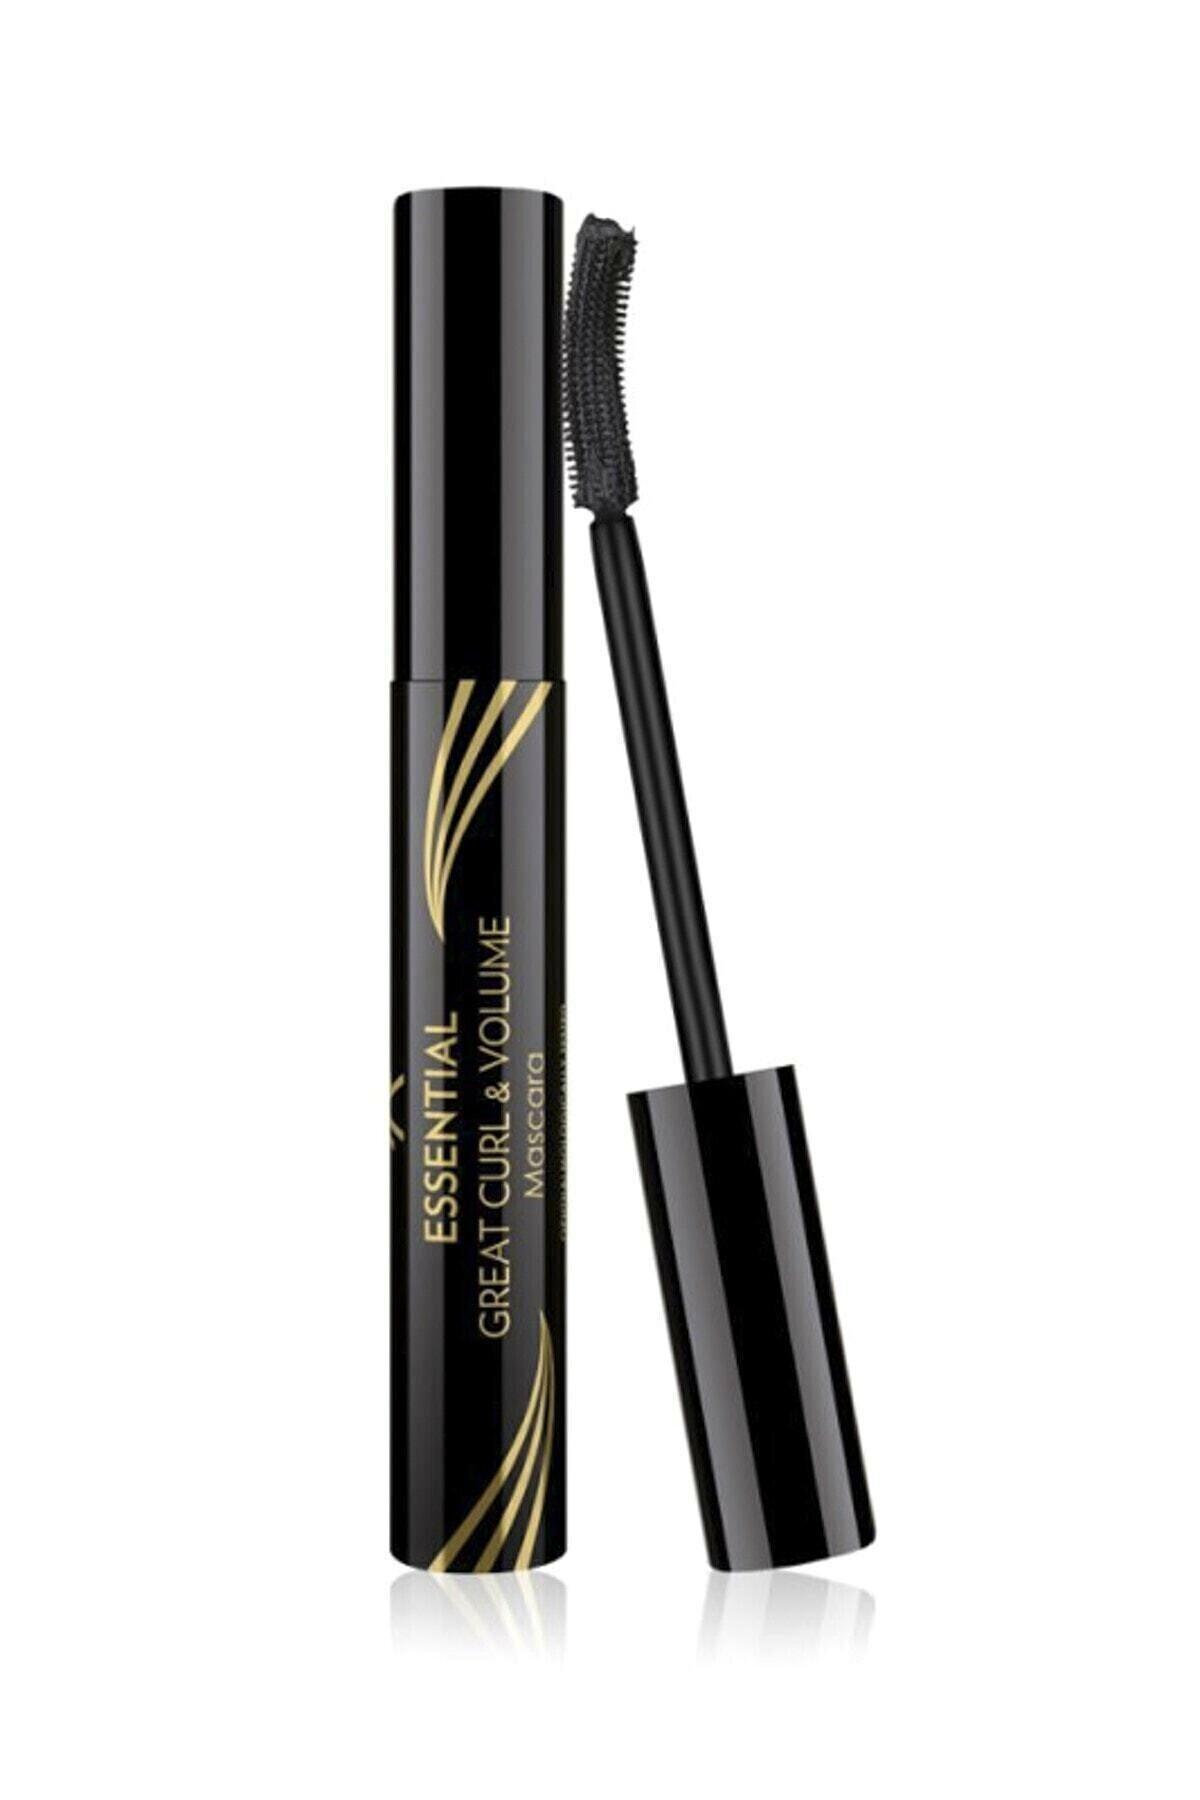 Golden Rose Kıvrım & Hacim Etkili Siyah Maskara - Essential Great Curl & Volume Mascara